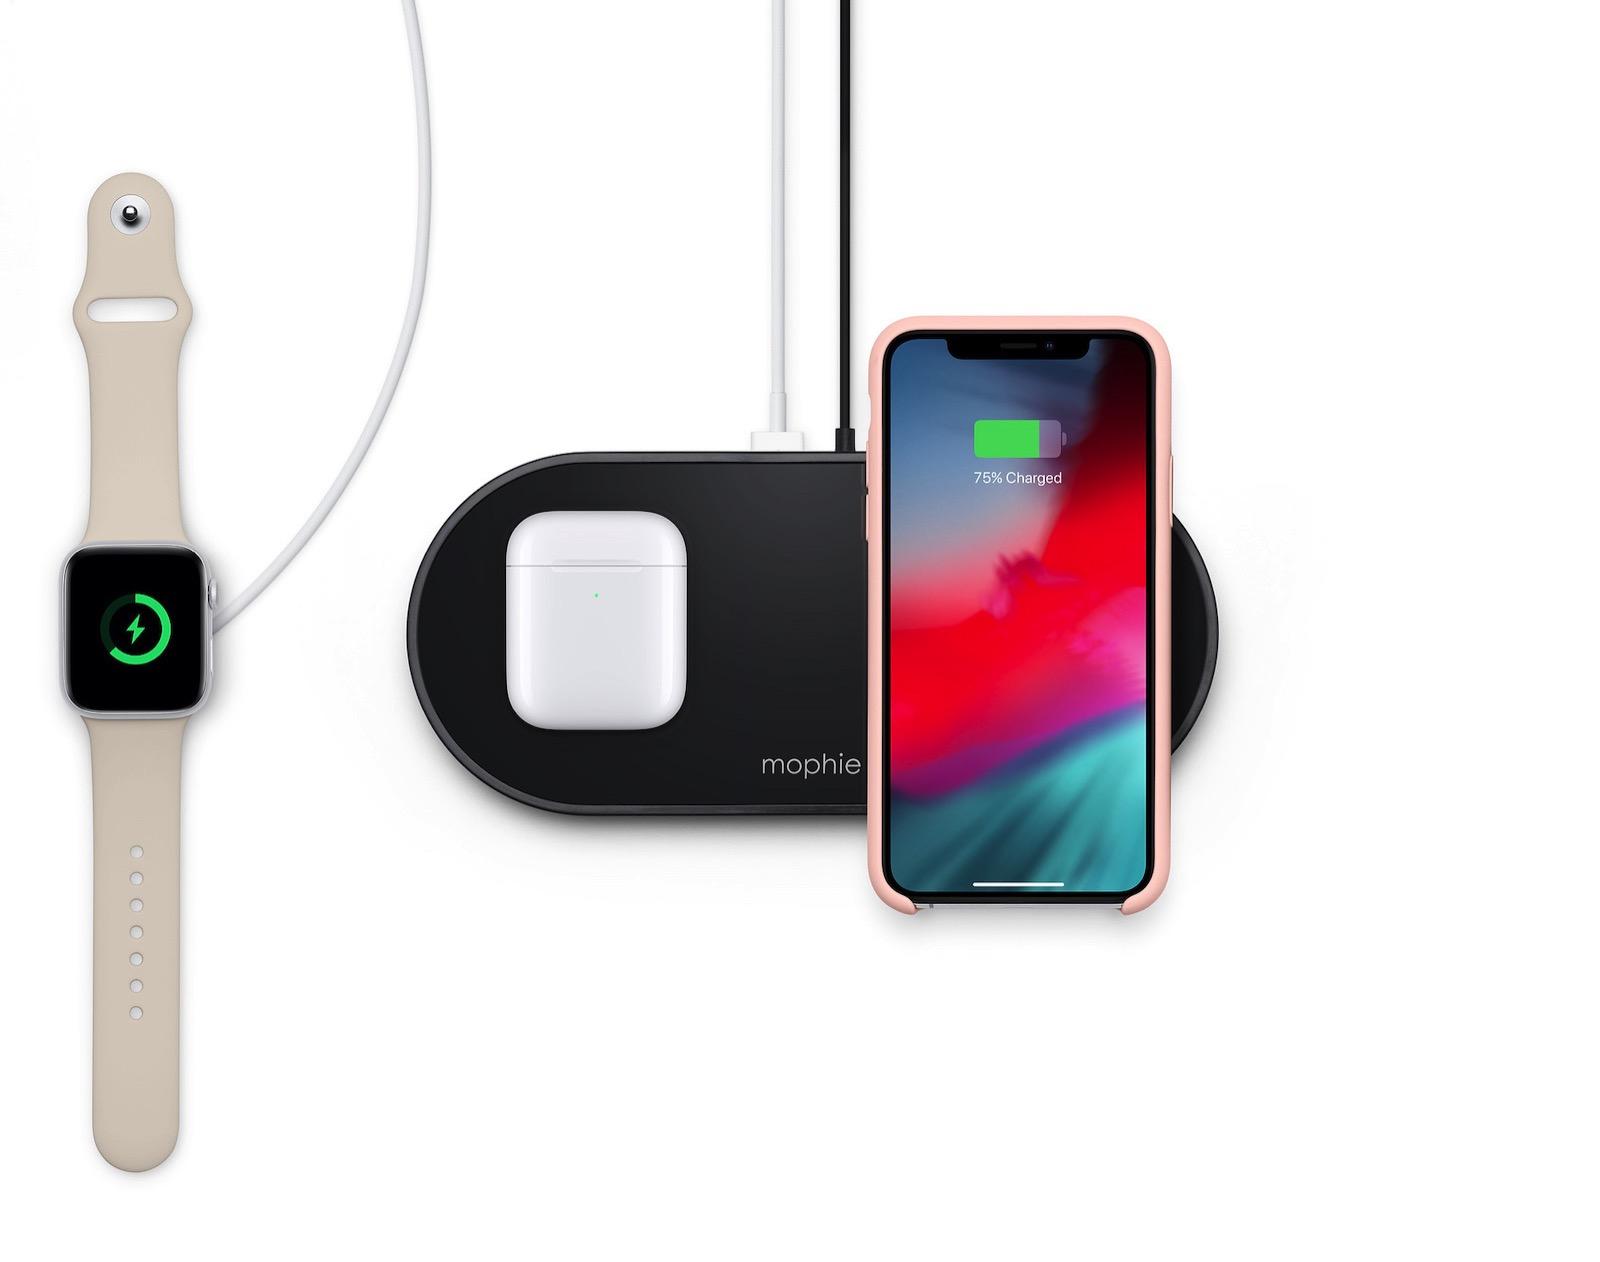 mophie-wireless-charging-dual-pad.jpeg